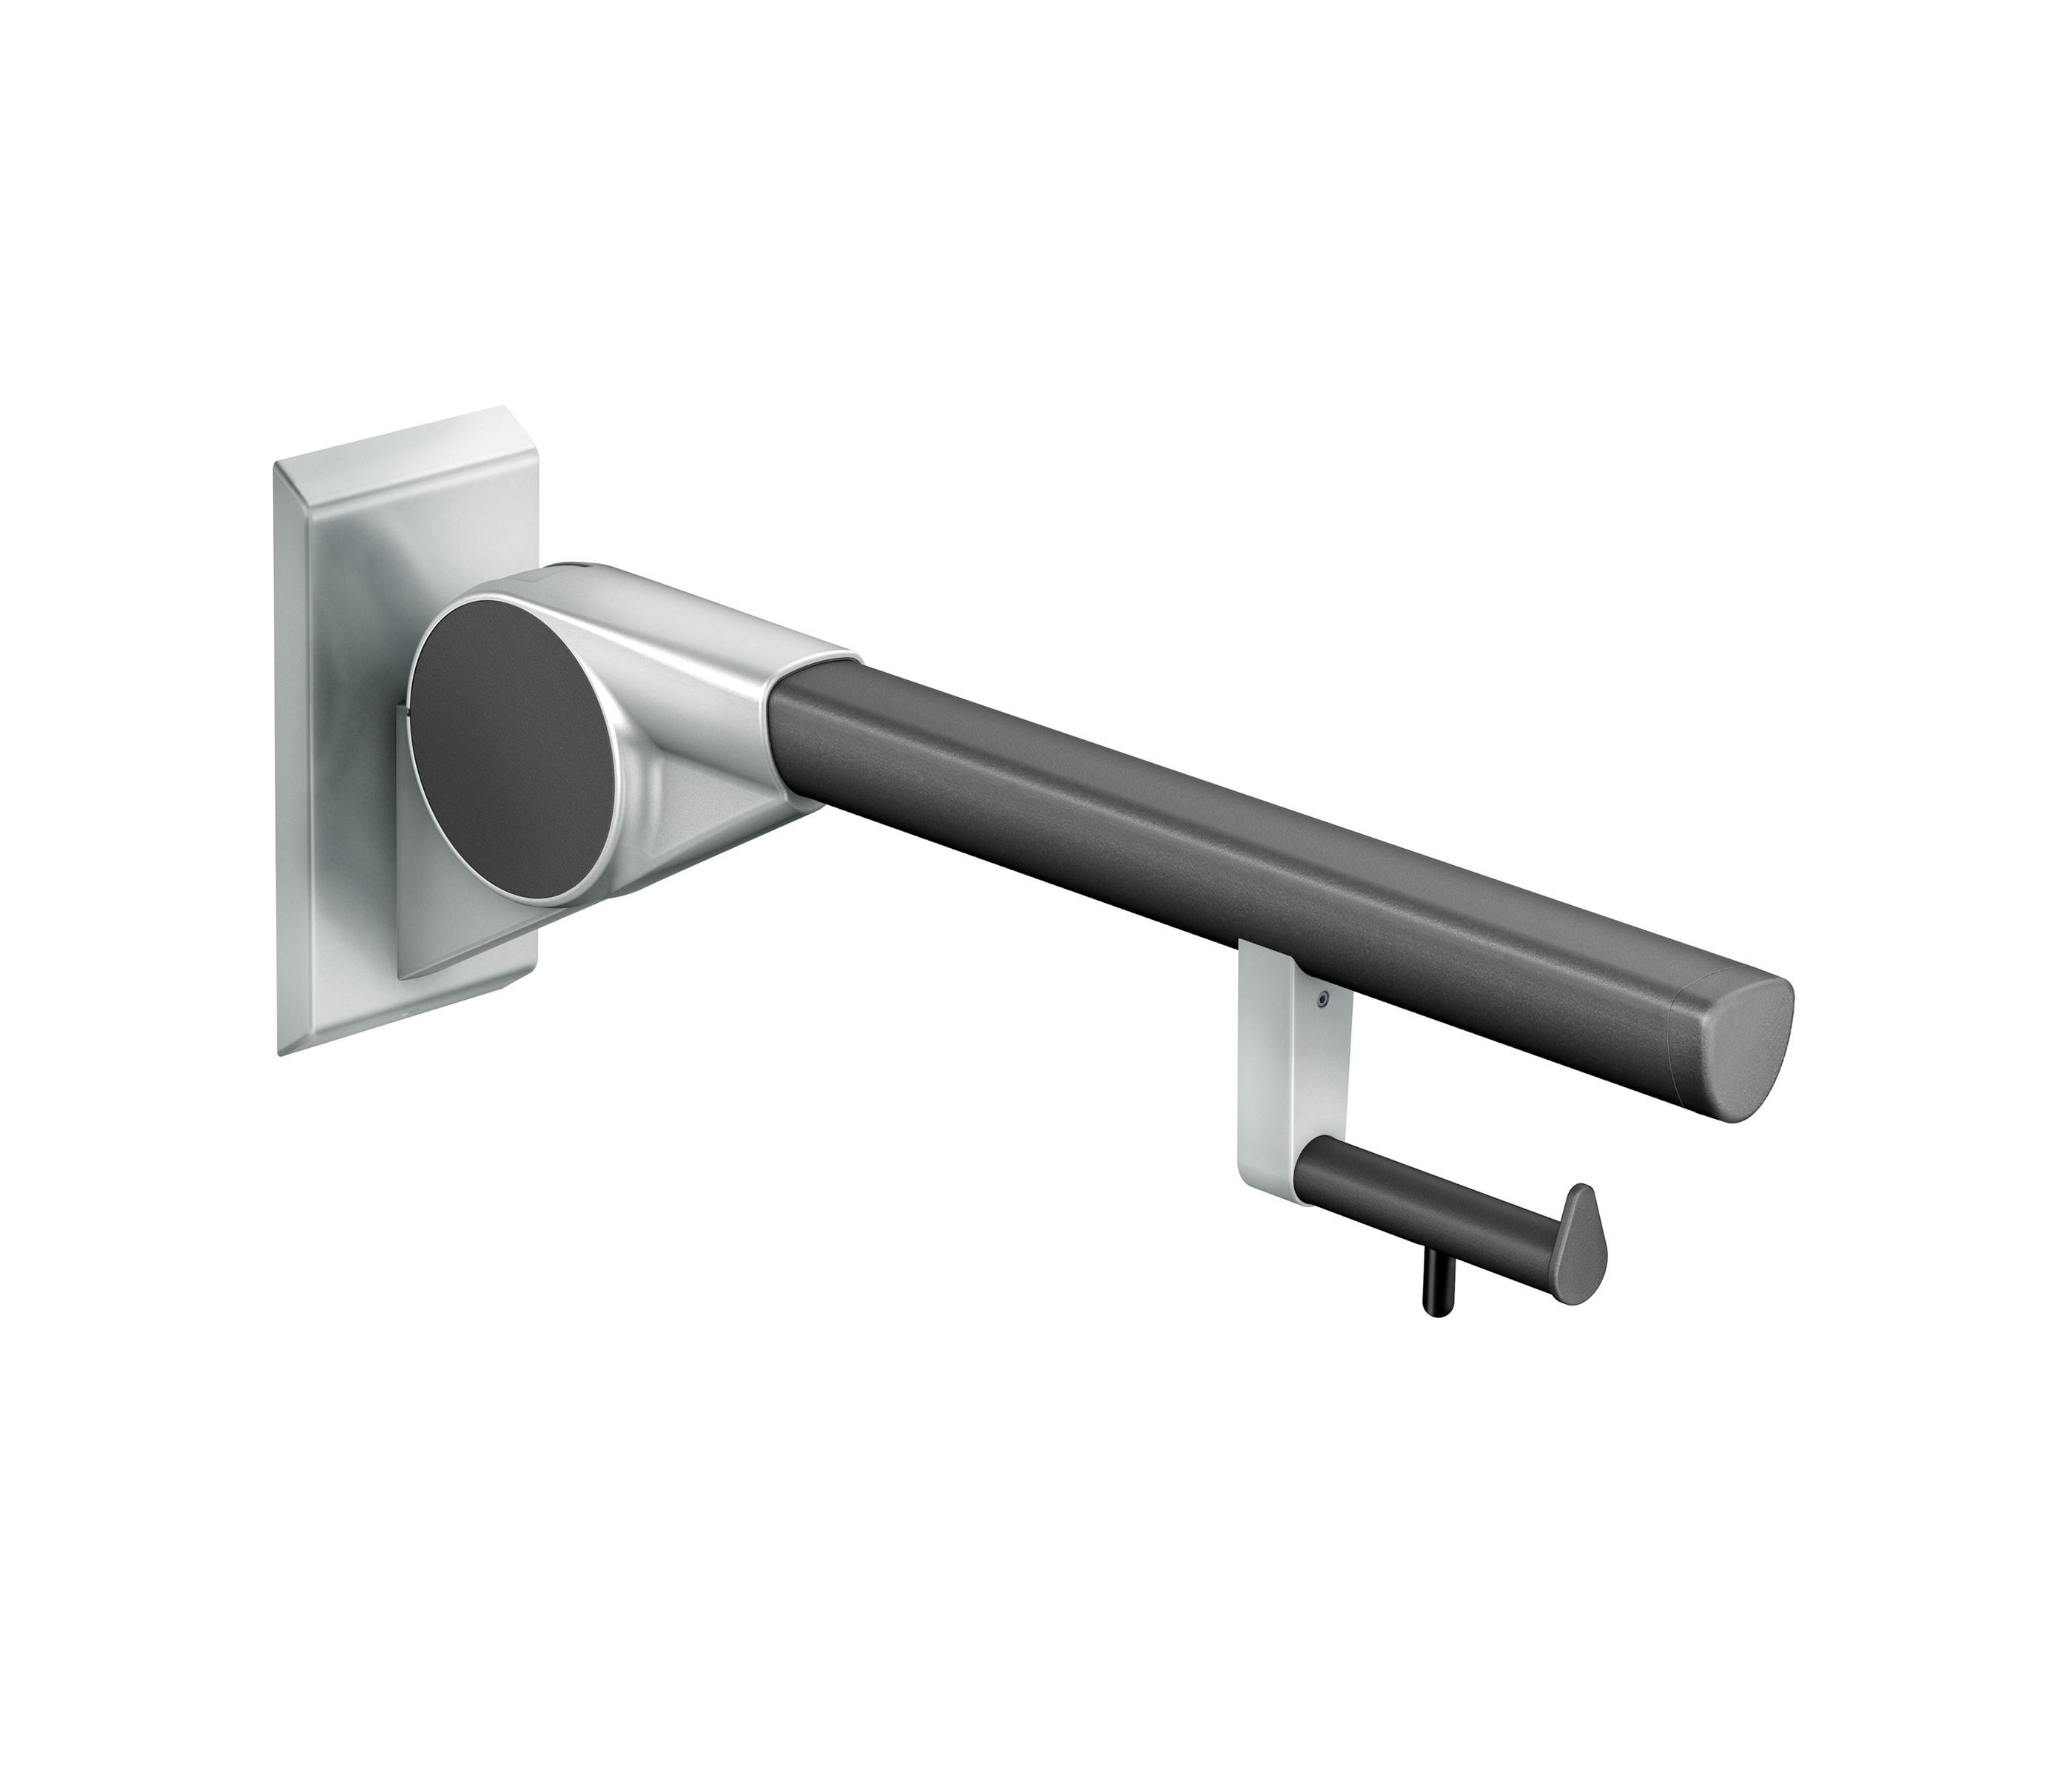 ergosystem a100 barre d 39 appui rabattable support bars de fsb architonic. Black Bedroom Furniture Sets. Home Design Ideas